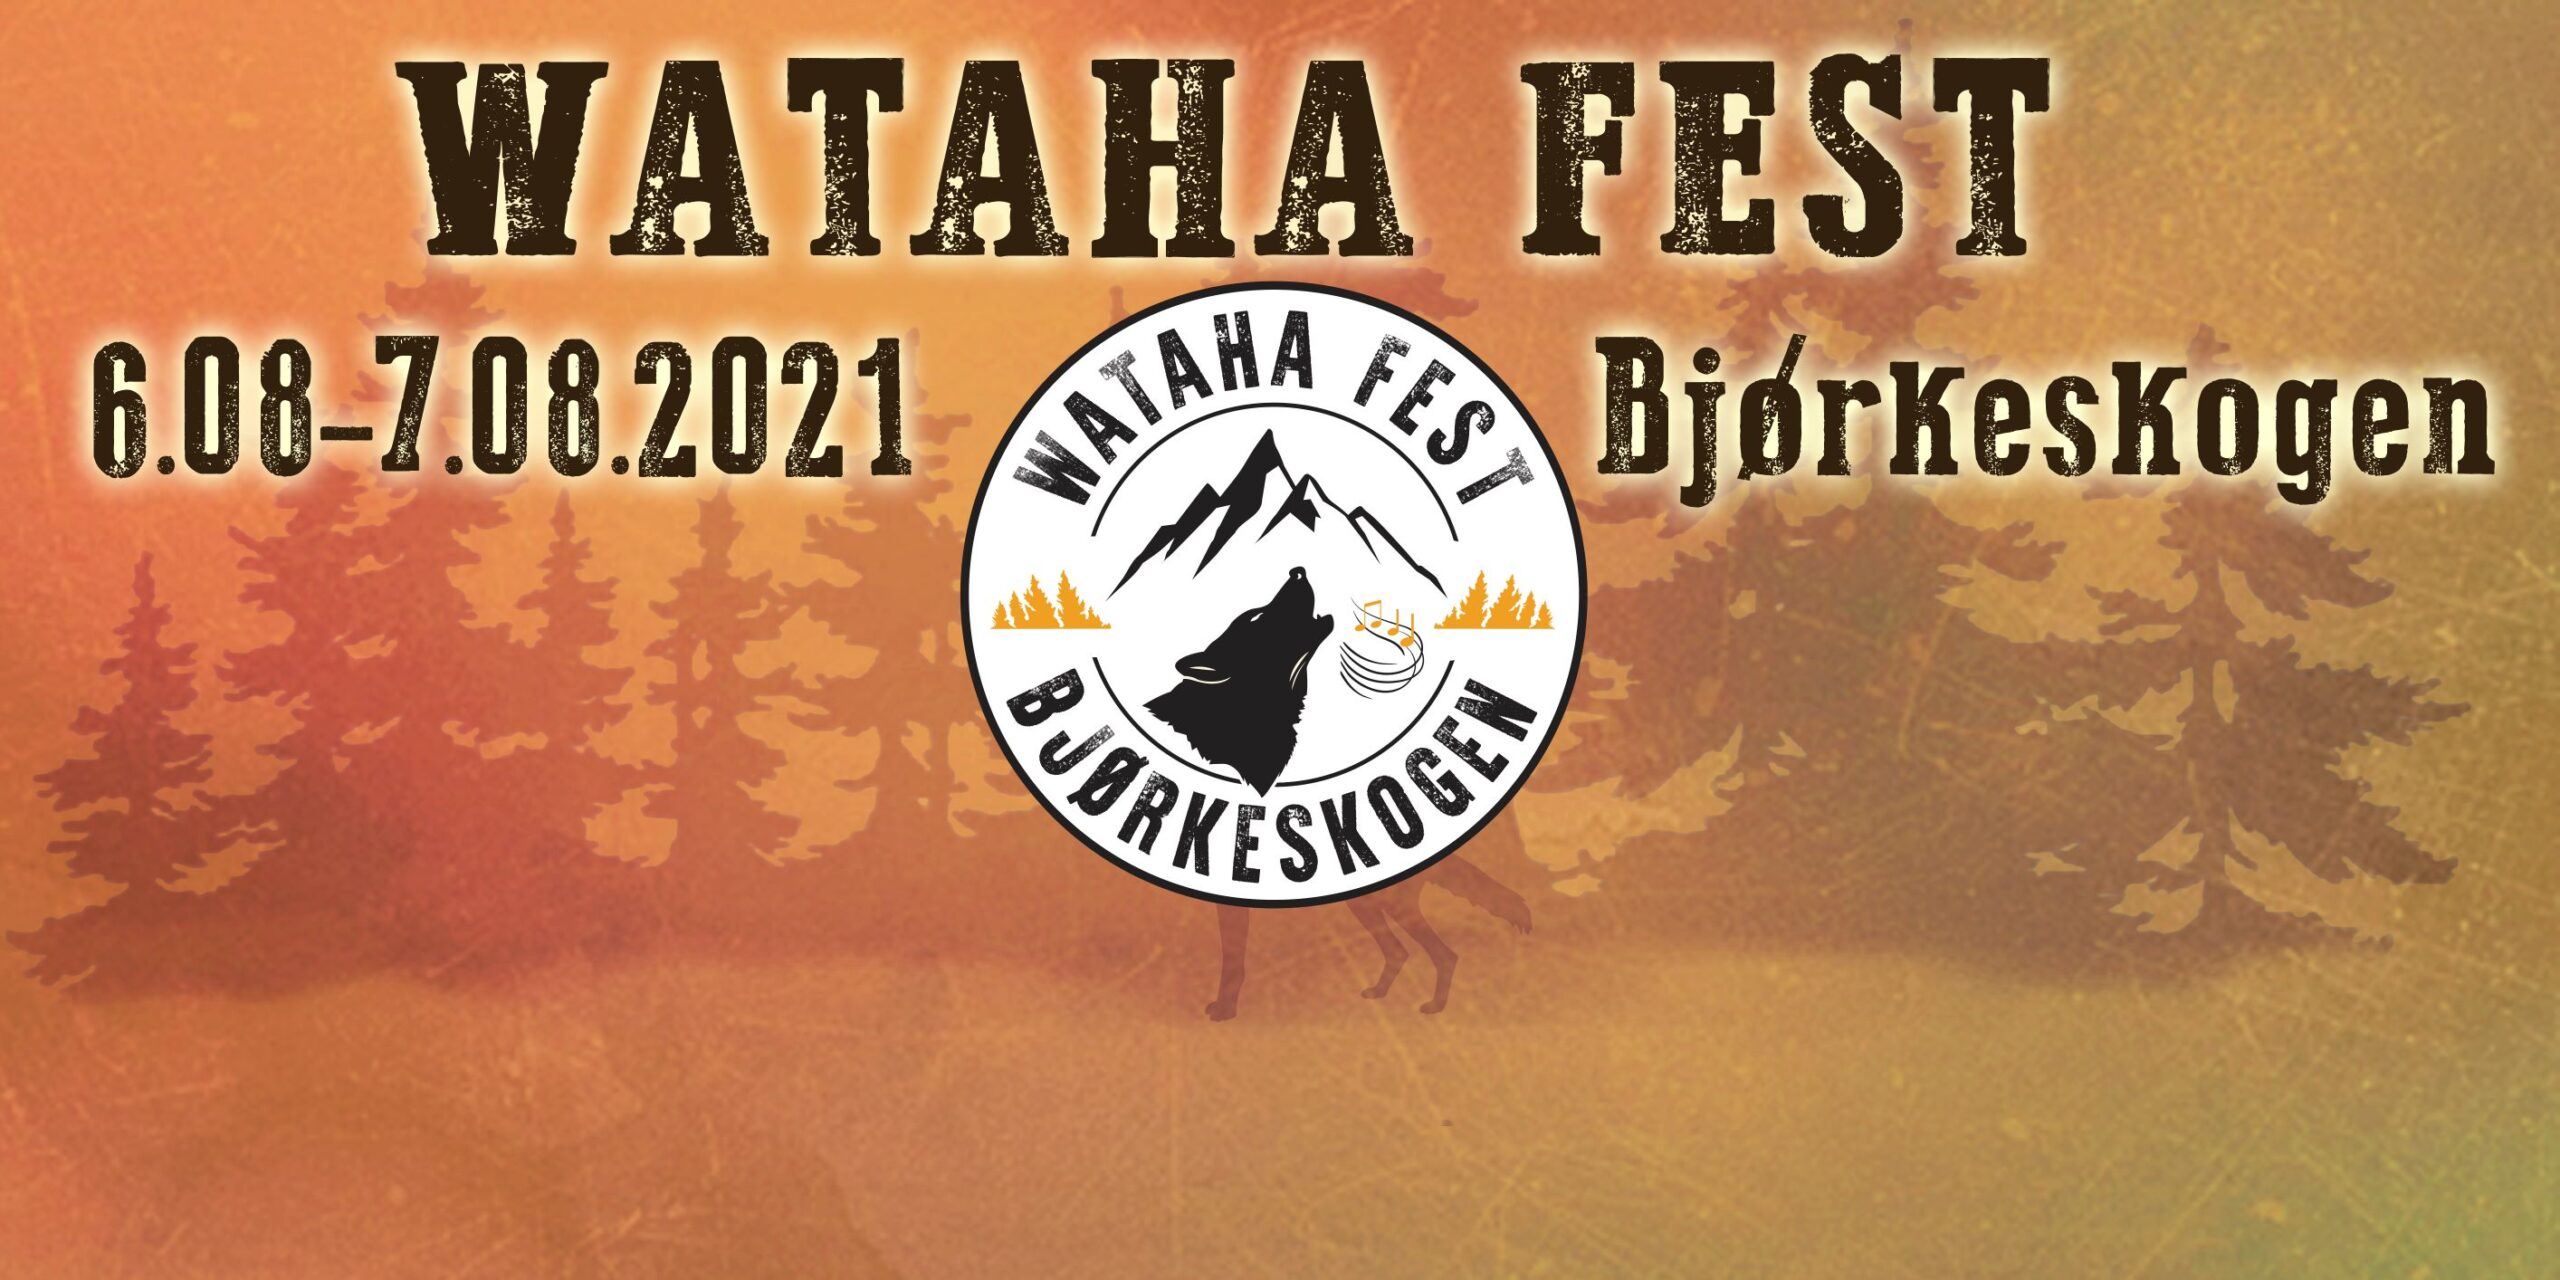 Festiwal WATAHA FEST